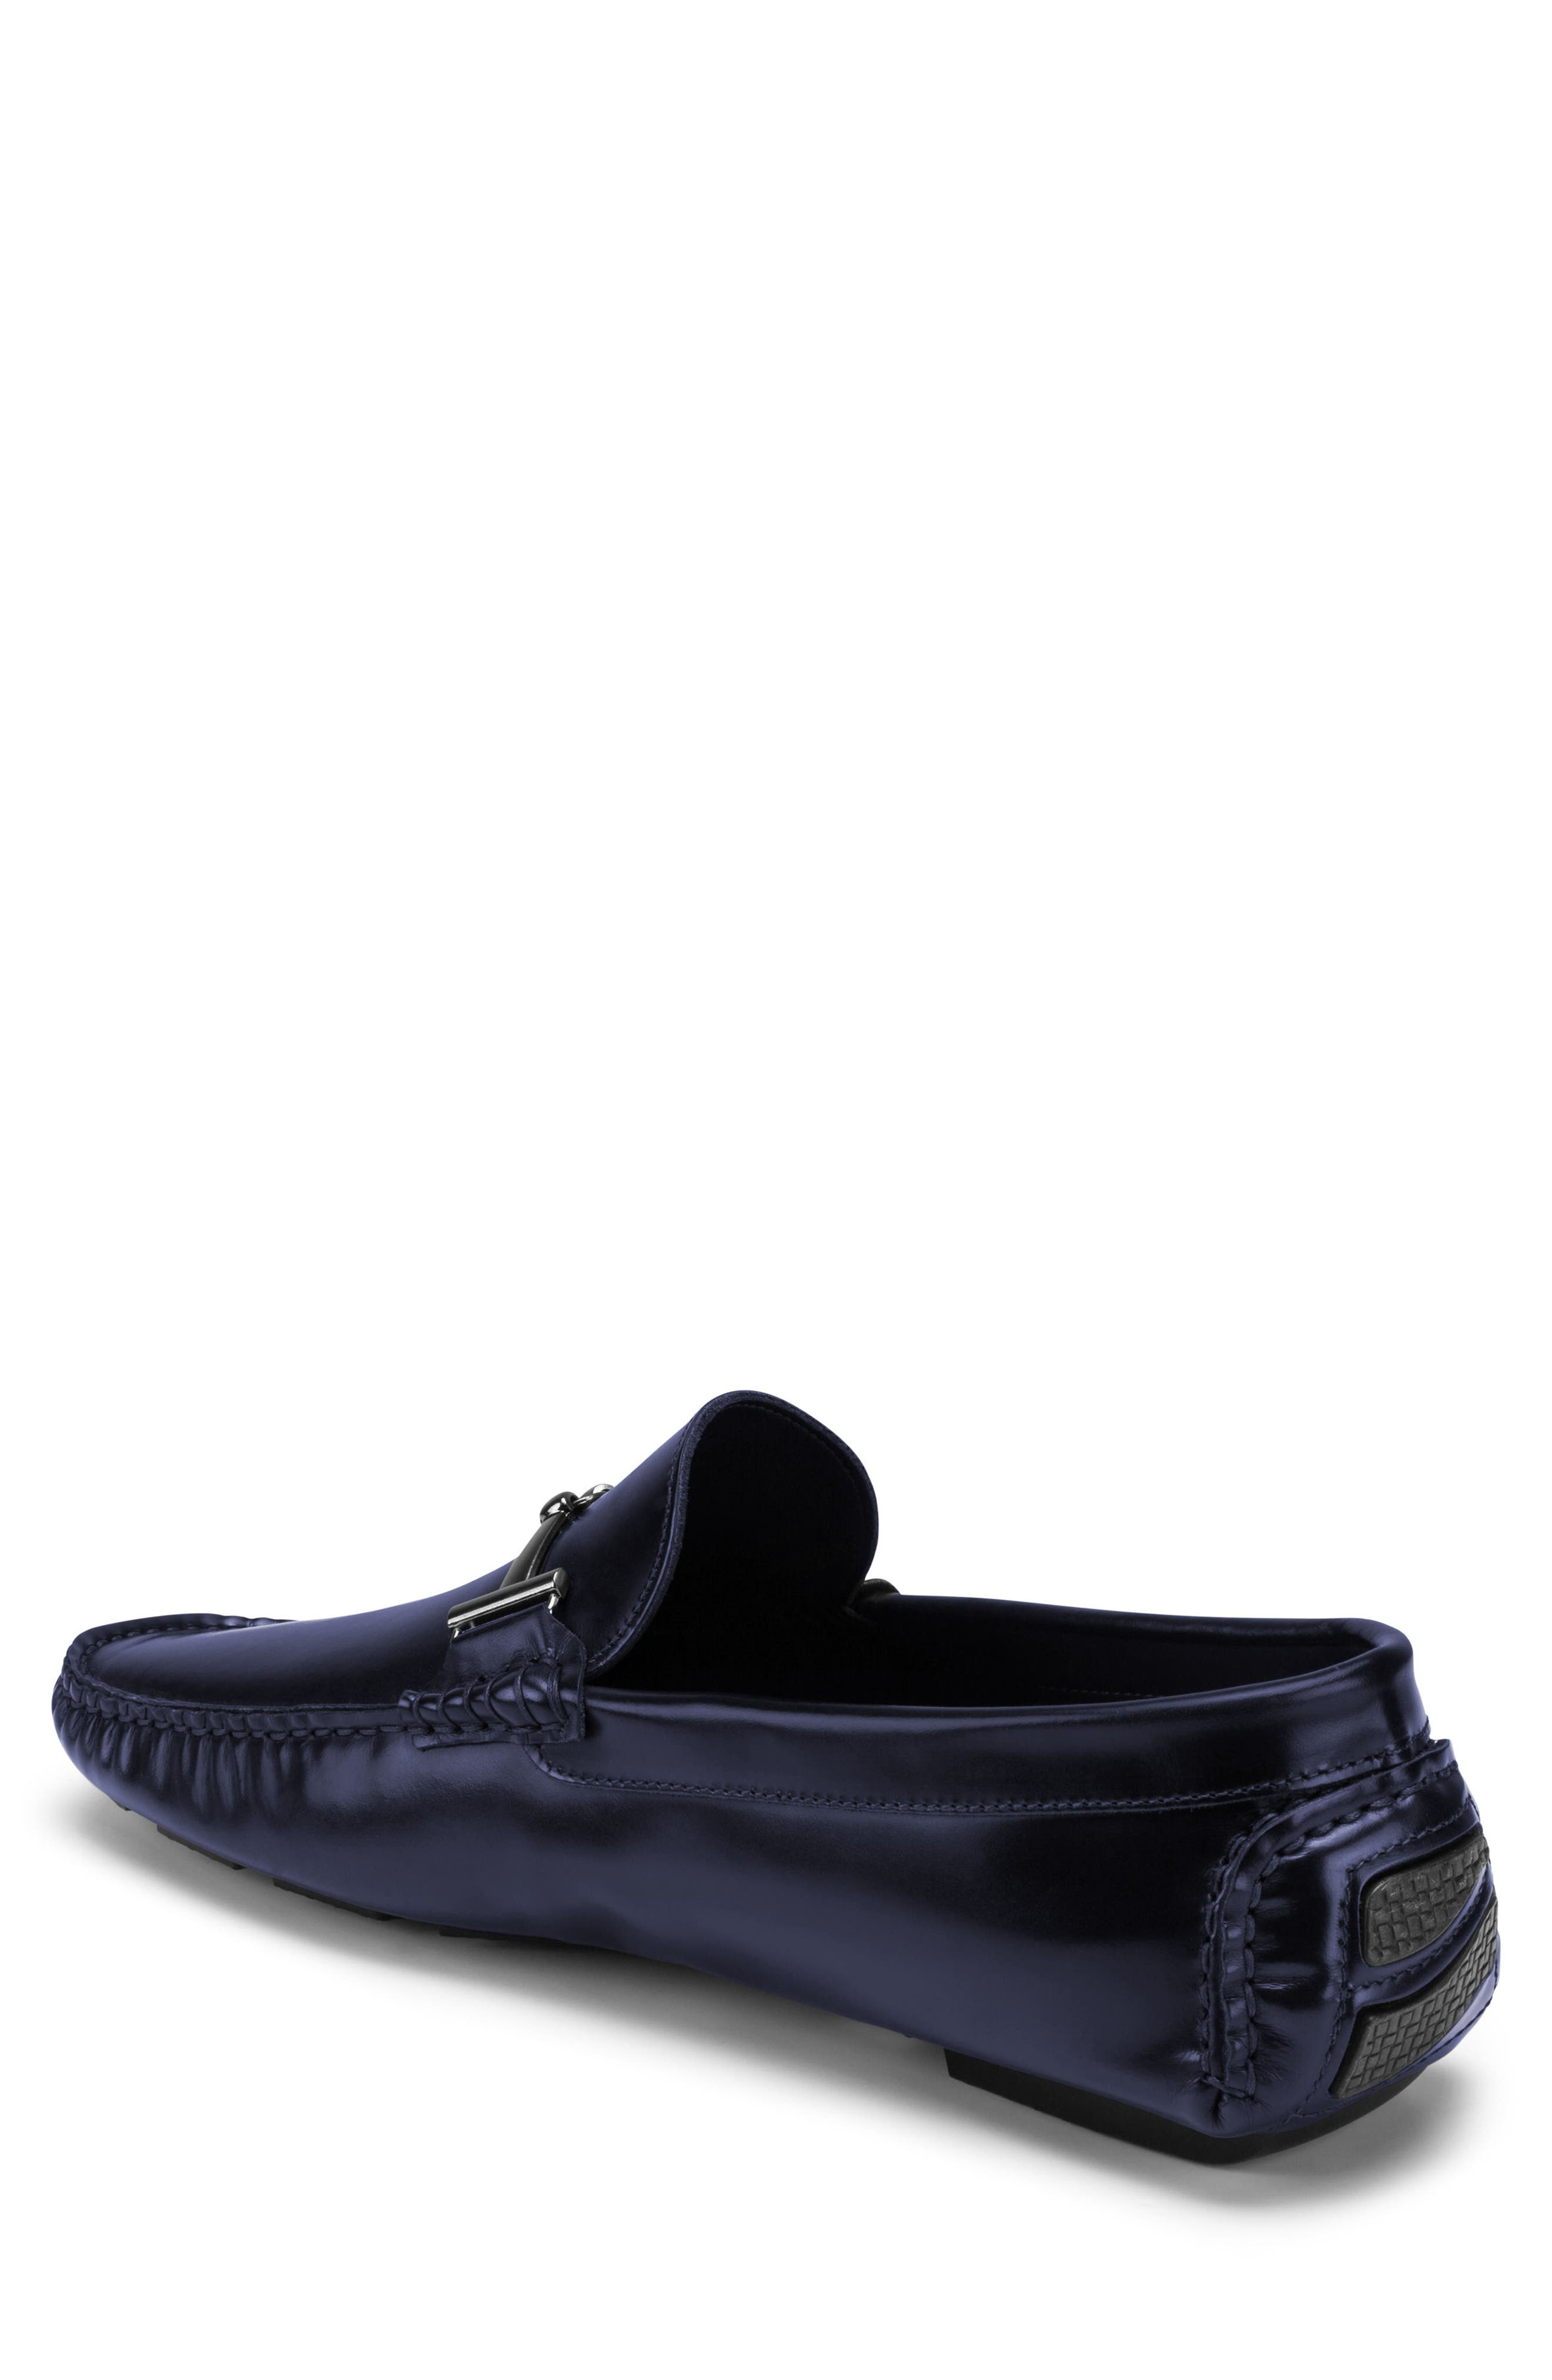 Alternate Image 2  - Bugatchi St. Tropez Driving Shoe (Men)